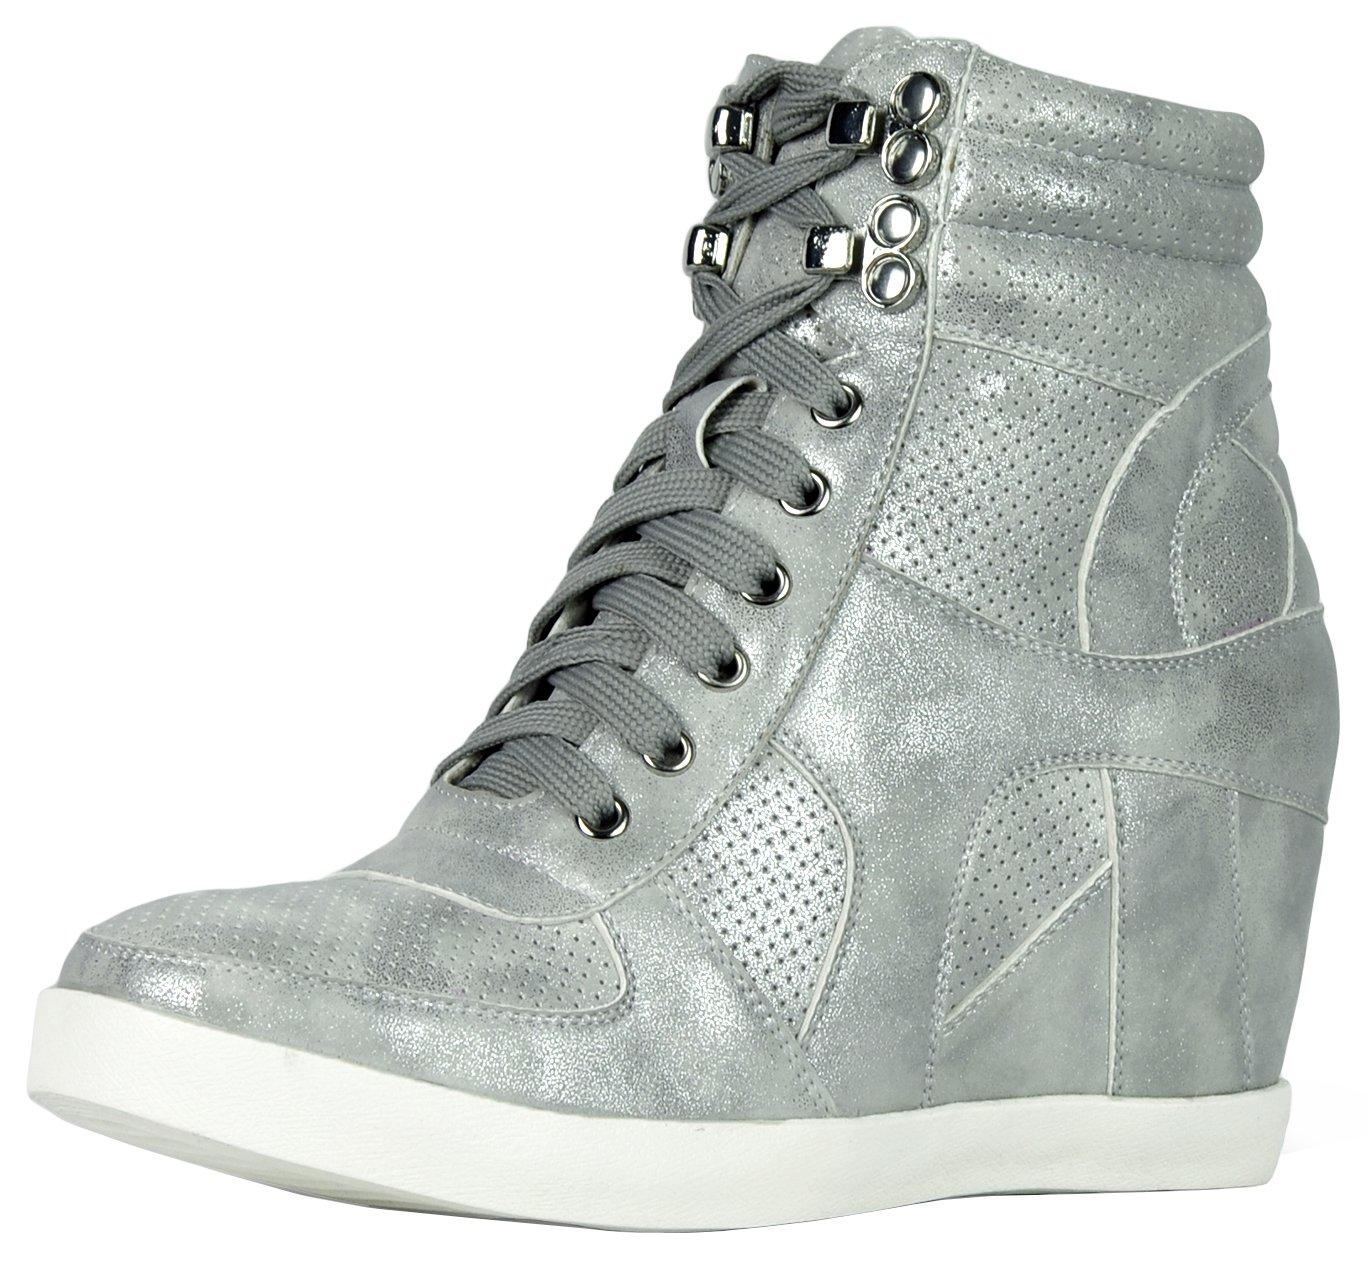 Refresh Footwear Women's High Top Hidden Wedge Fashion Sneaker B075QQ1ZM8 8.5 B(M) US|Silver